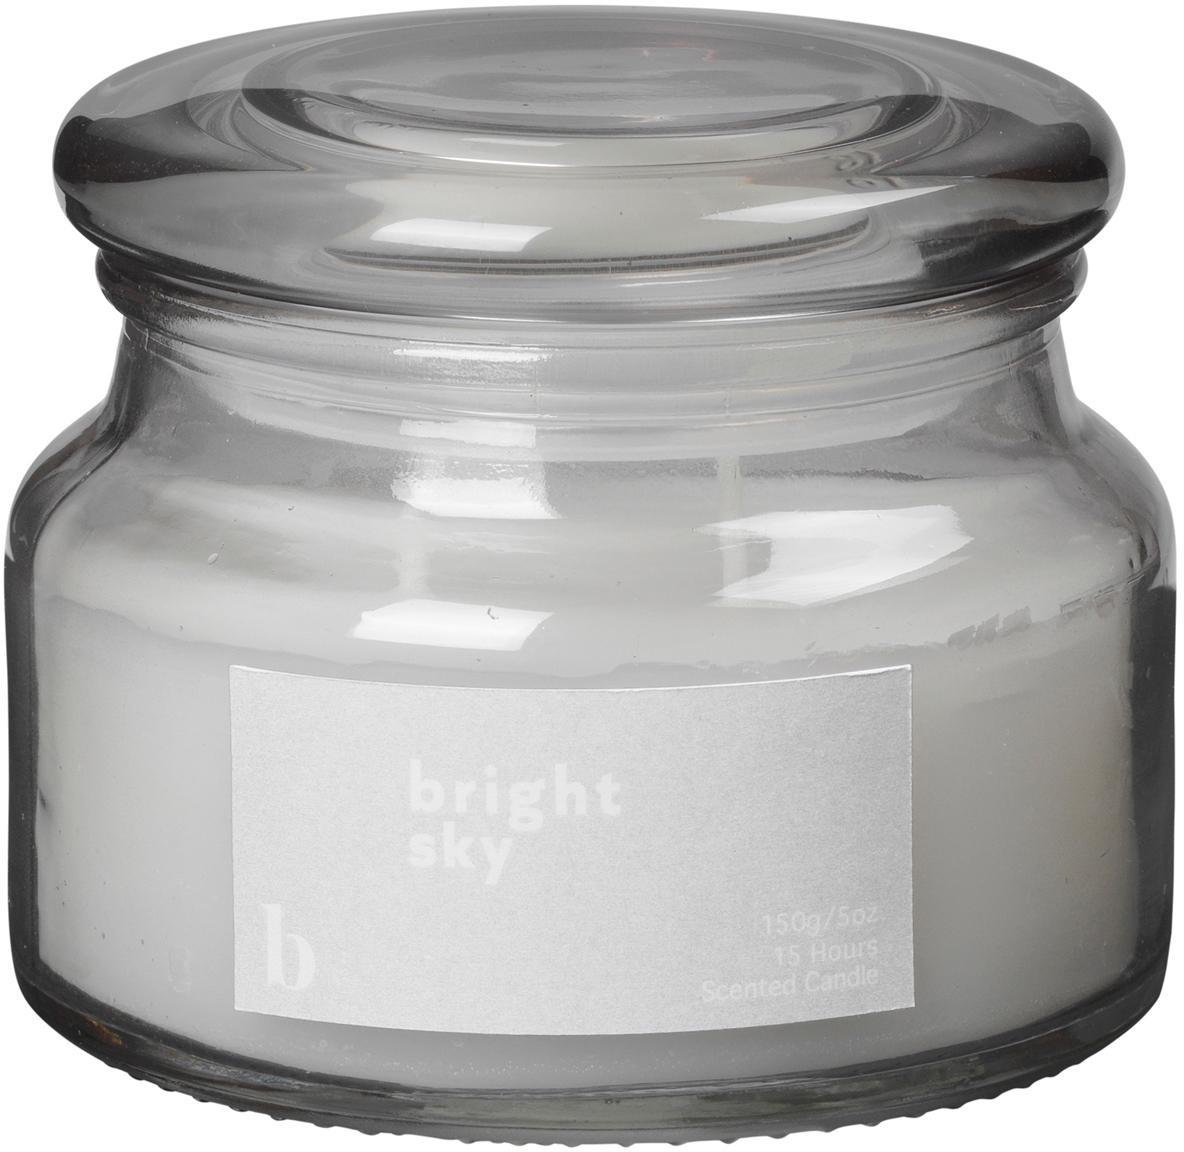 Duftkerze Bright Sky (Blumig), Behälter: Glas, Grau, Ø 10 x H 8 cm